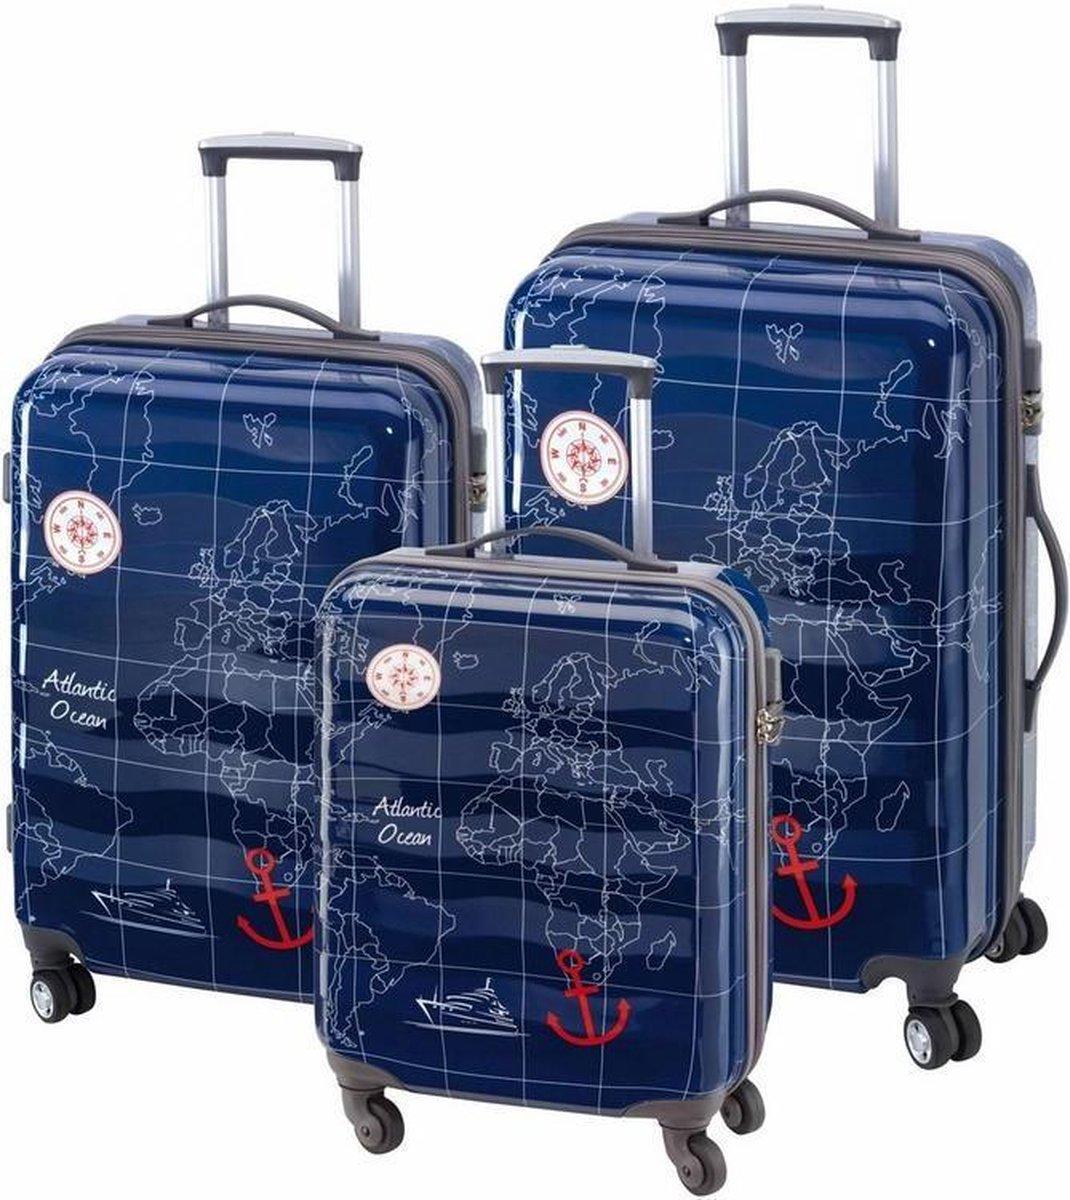 3-delige ABS/Polycarbonaat reiskoffer set-Madeira Check.In kopen